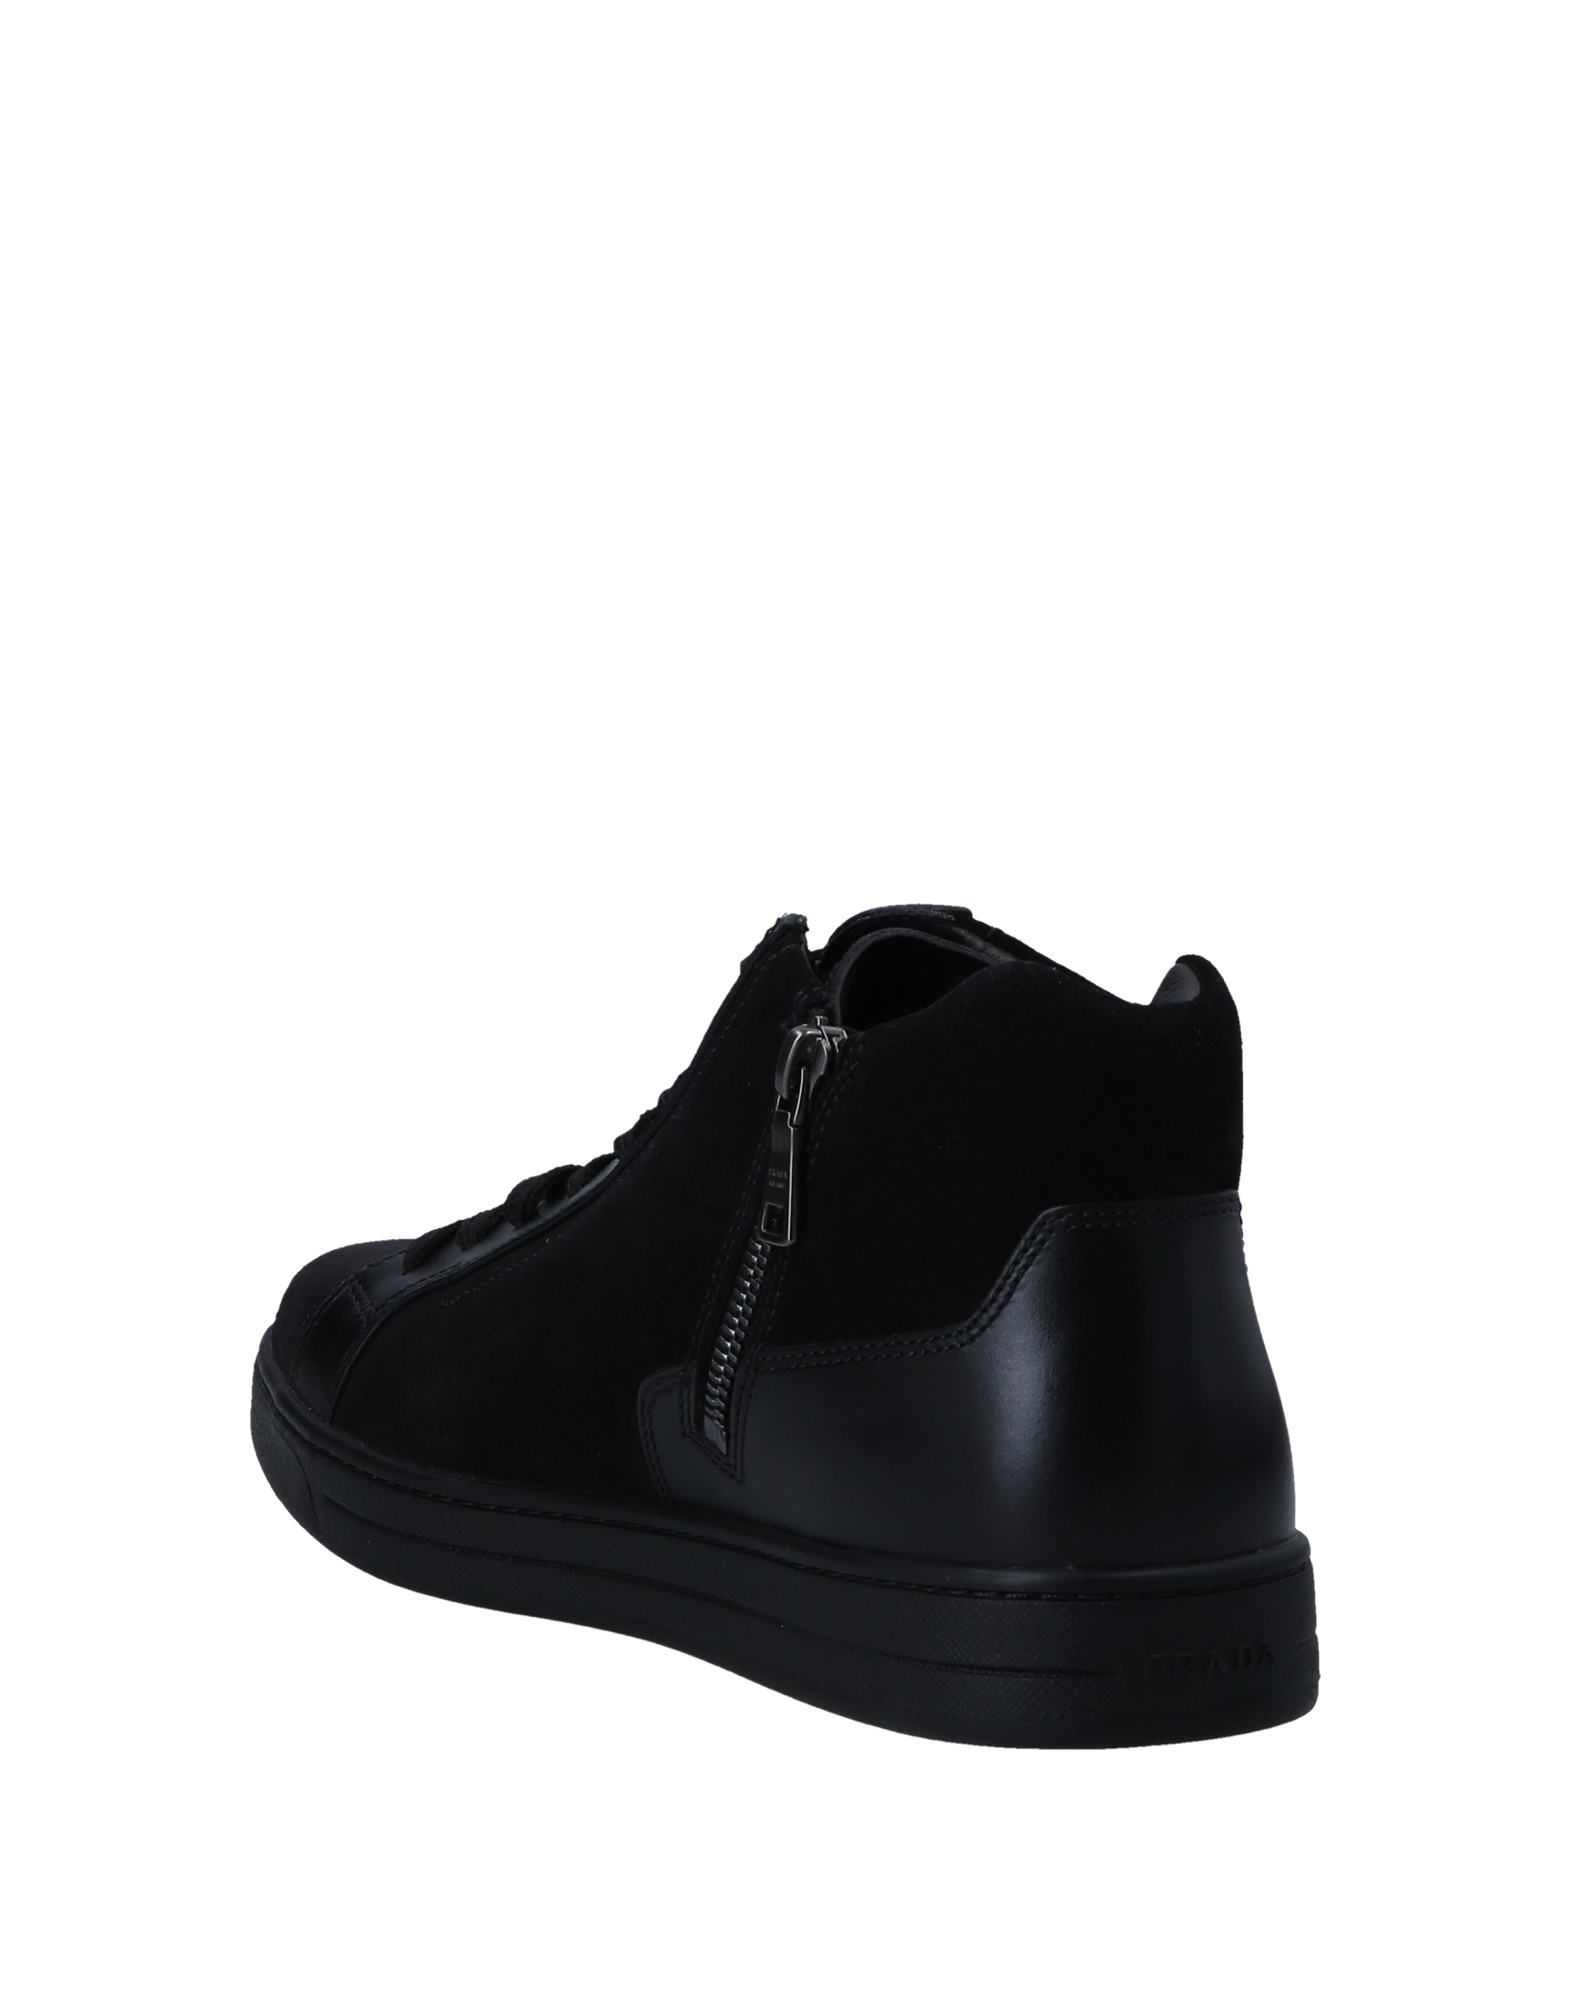 Prada Sport Sneakers Herren  11550024DW Gute Qualität beliebte Schuhe